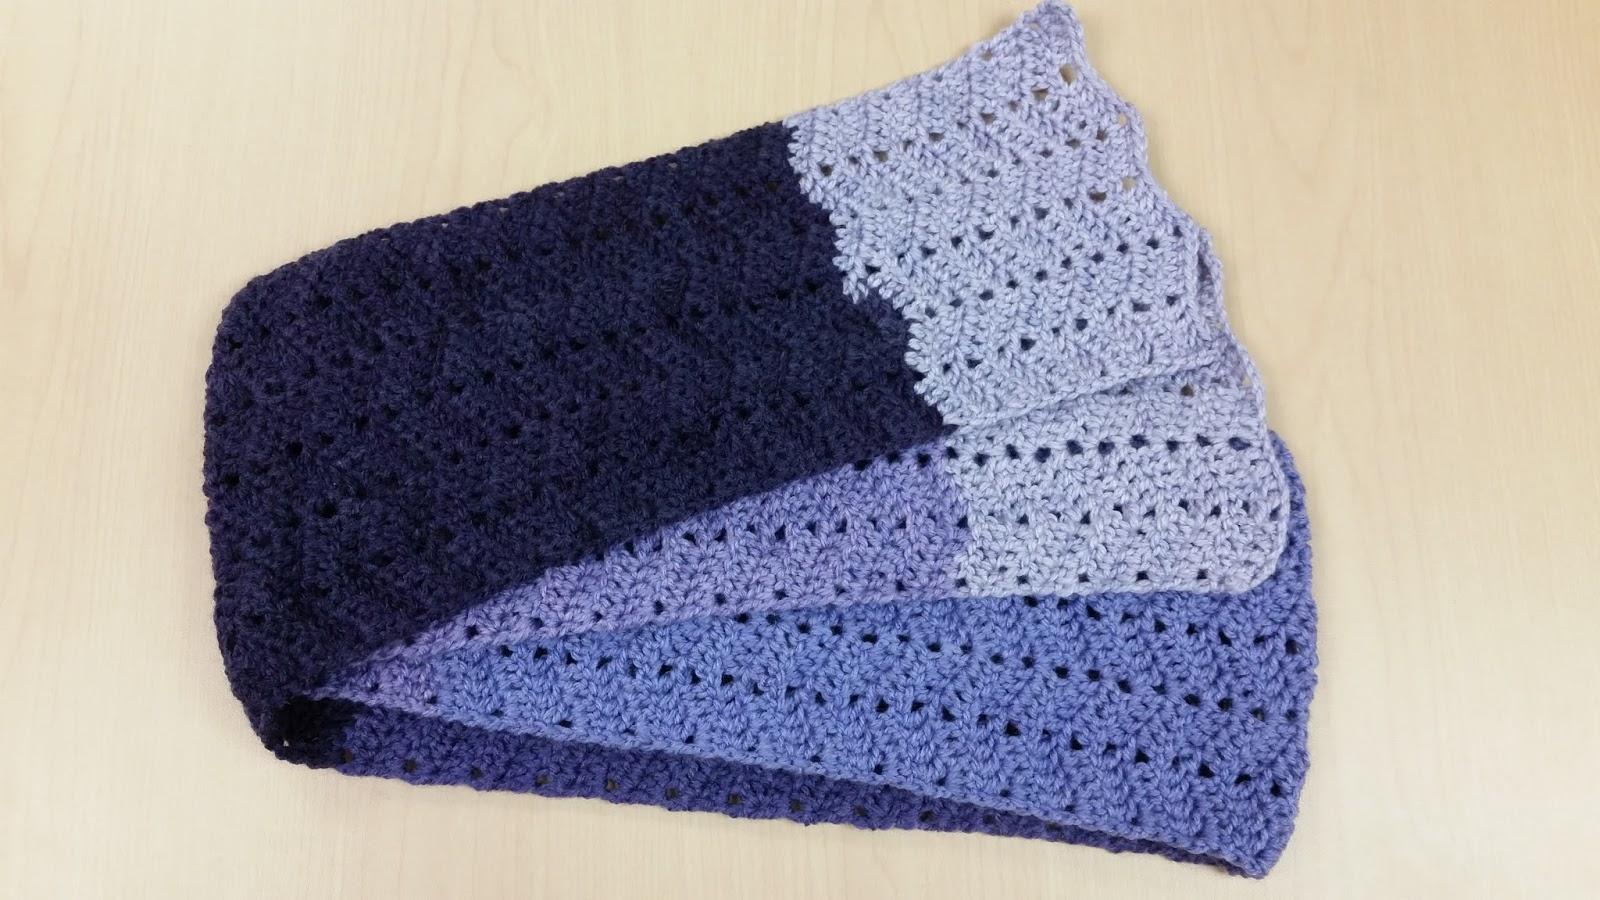 The Wandering Bunny Crochet Wave Scarf Rainy Day Crocheting